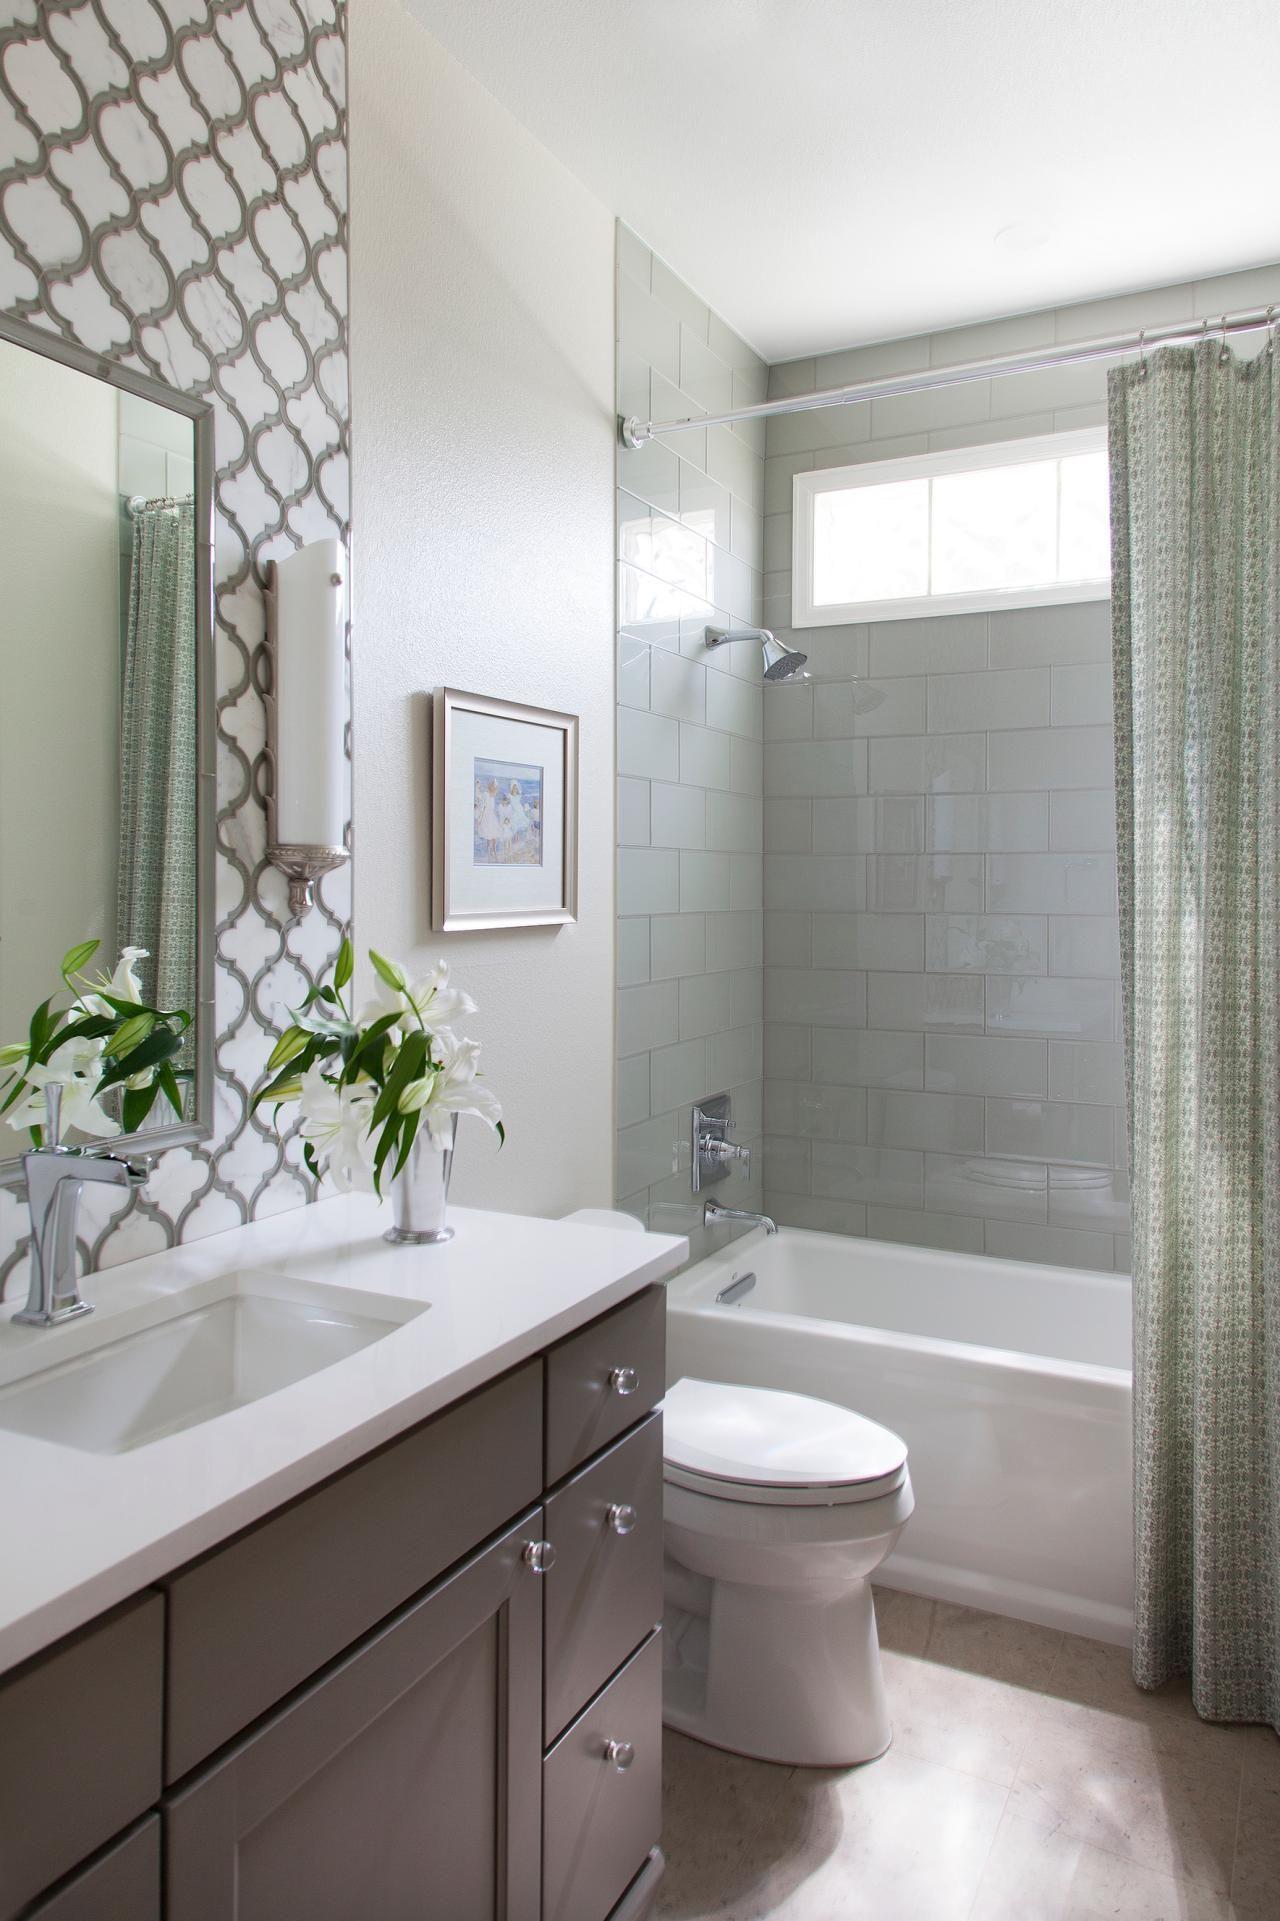 Traditional Guest Bath With Decorative Tile Backsplash Small Bathroom Renovations Bathroom Tub Shower Combo Bathroom Design Small